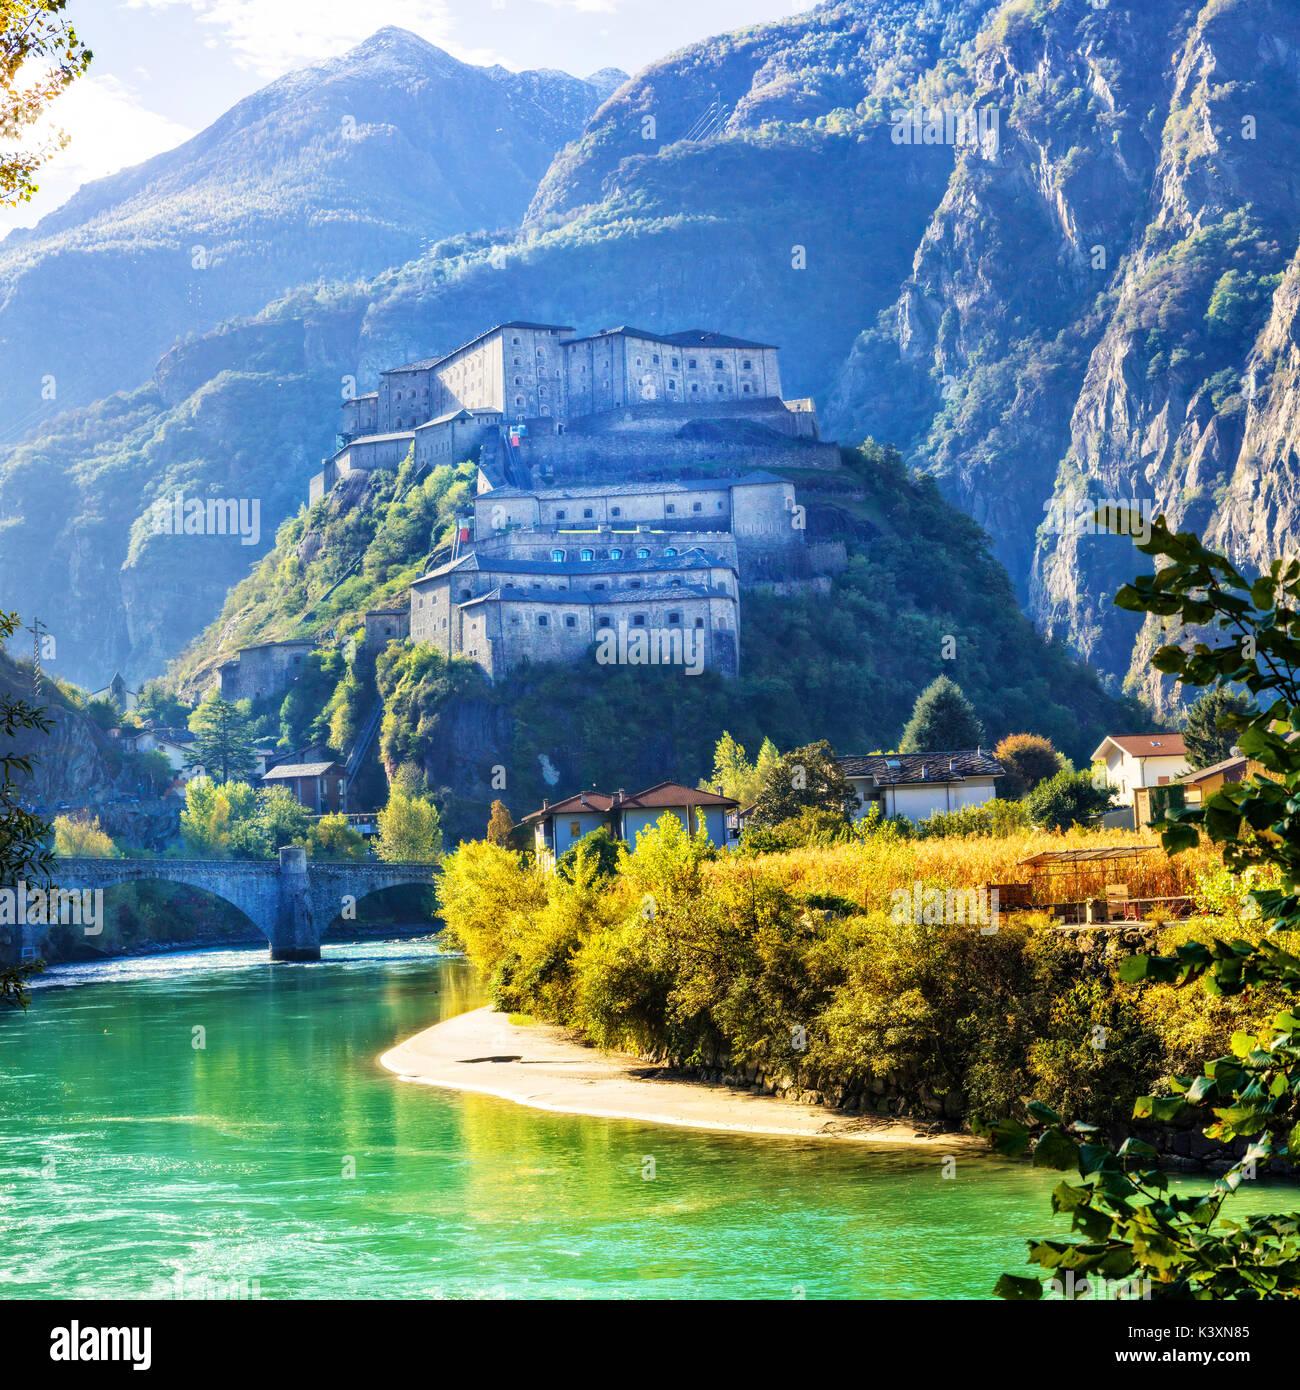 Impresive Bard castle,Valle d' Aosta,Italy. - Stock Image